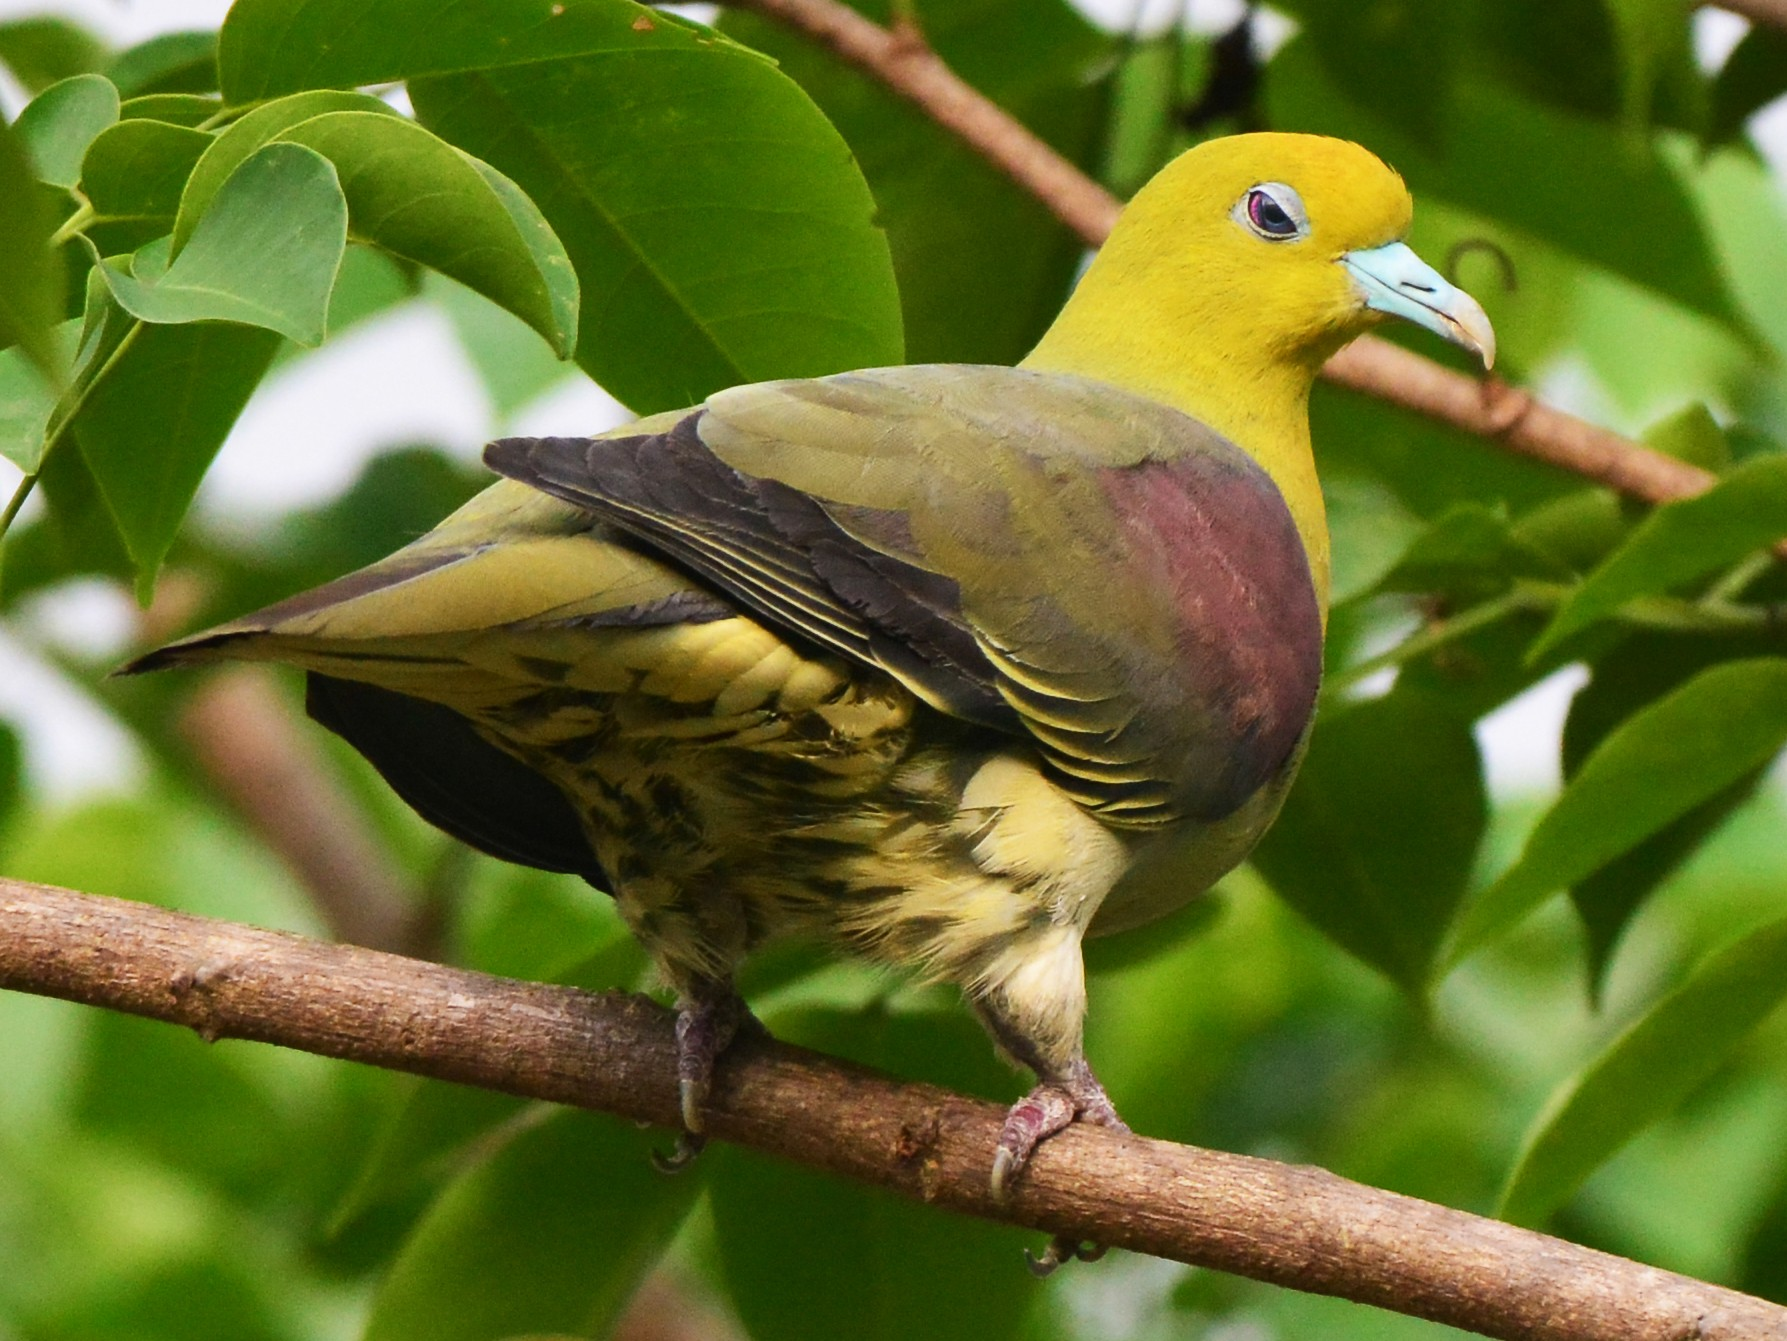 White-bellied Green-Pigeon - Jhih-Weit (志偉) TSAI (蔡)